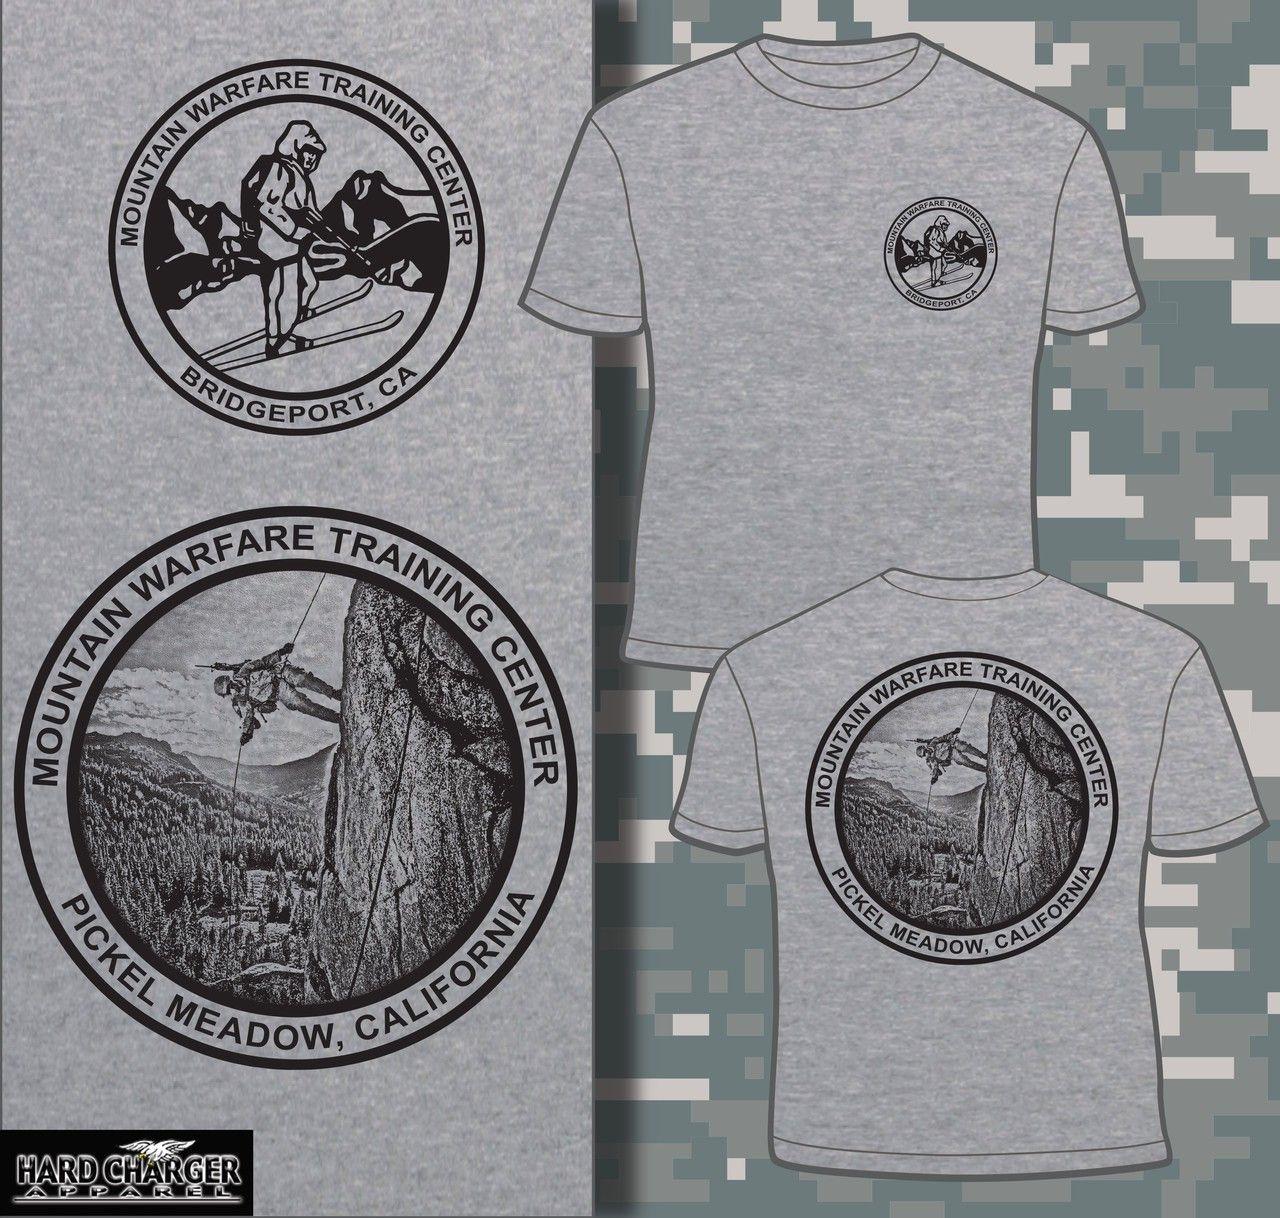 AMPHIBIOUS RECONNAISSANCE HOODIE SWEATSHIRT//MILITARY//USMC// RECON// front only